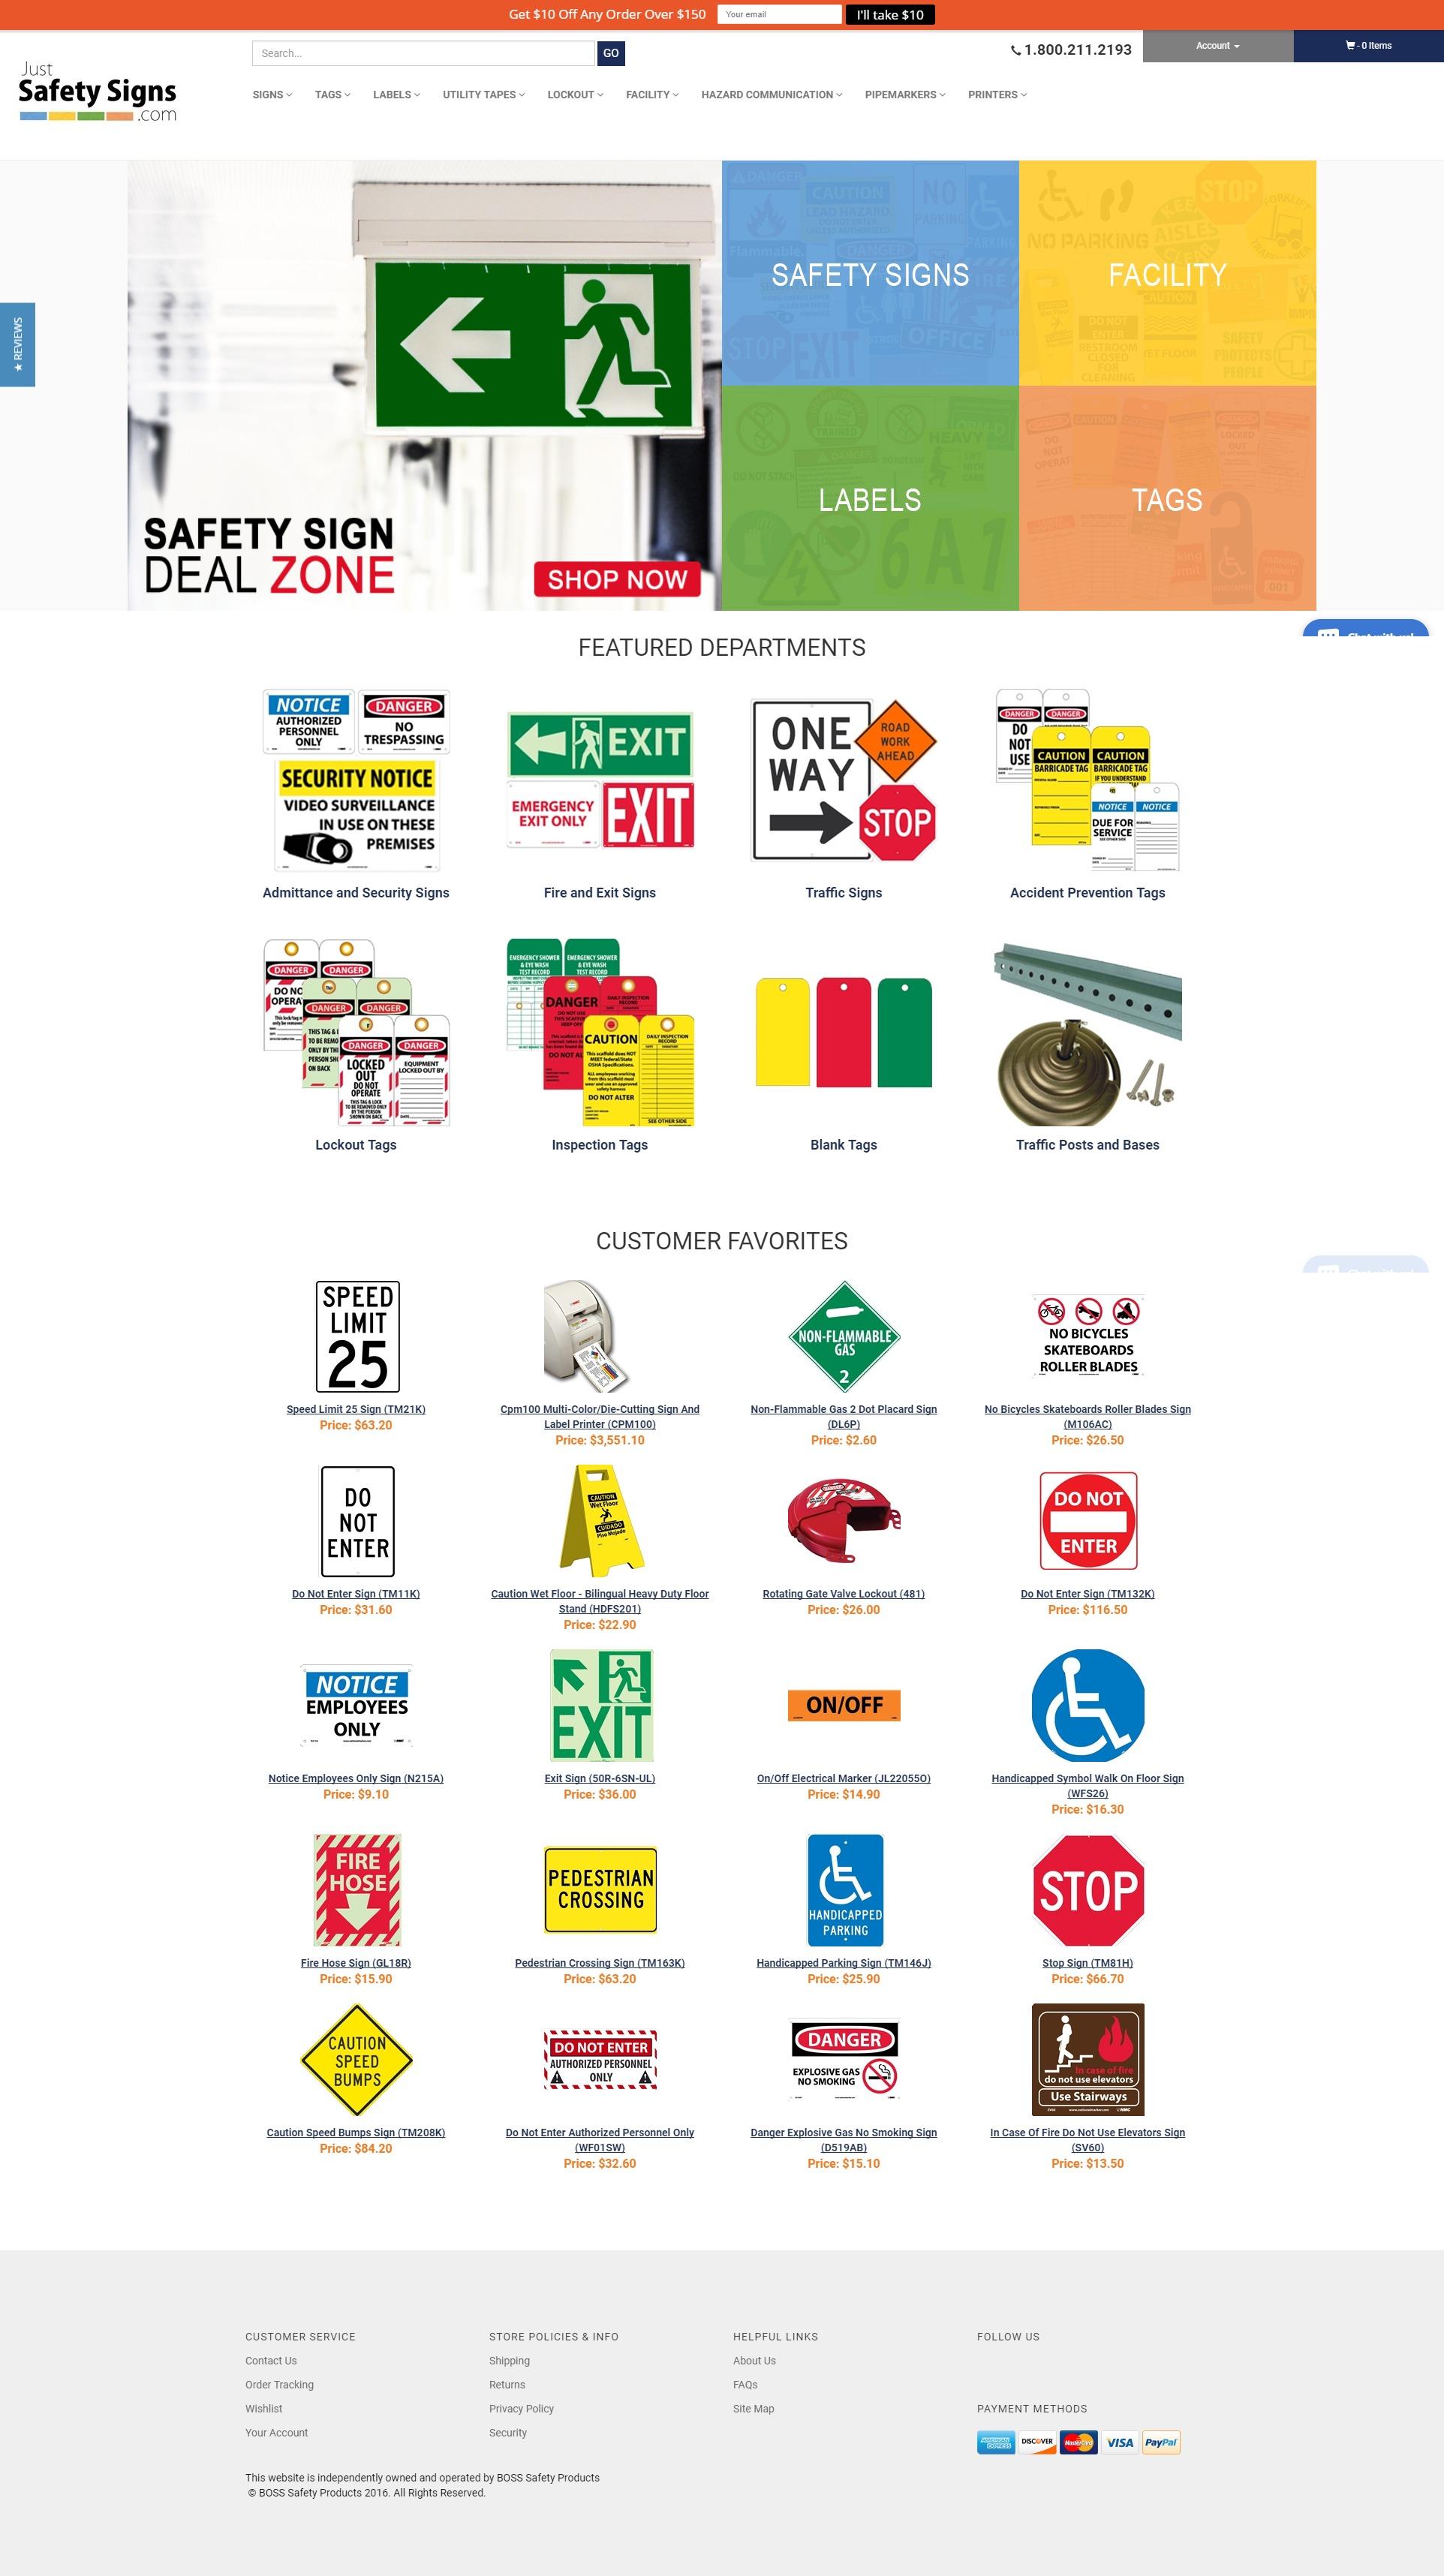 FireShot Capture 007 - Just Safety Signs - http___justsafetysigns.com_.jpg